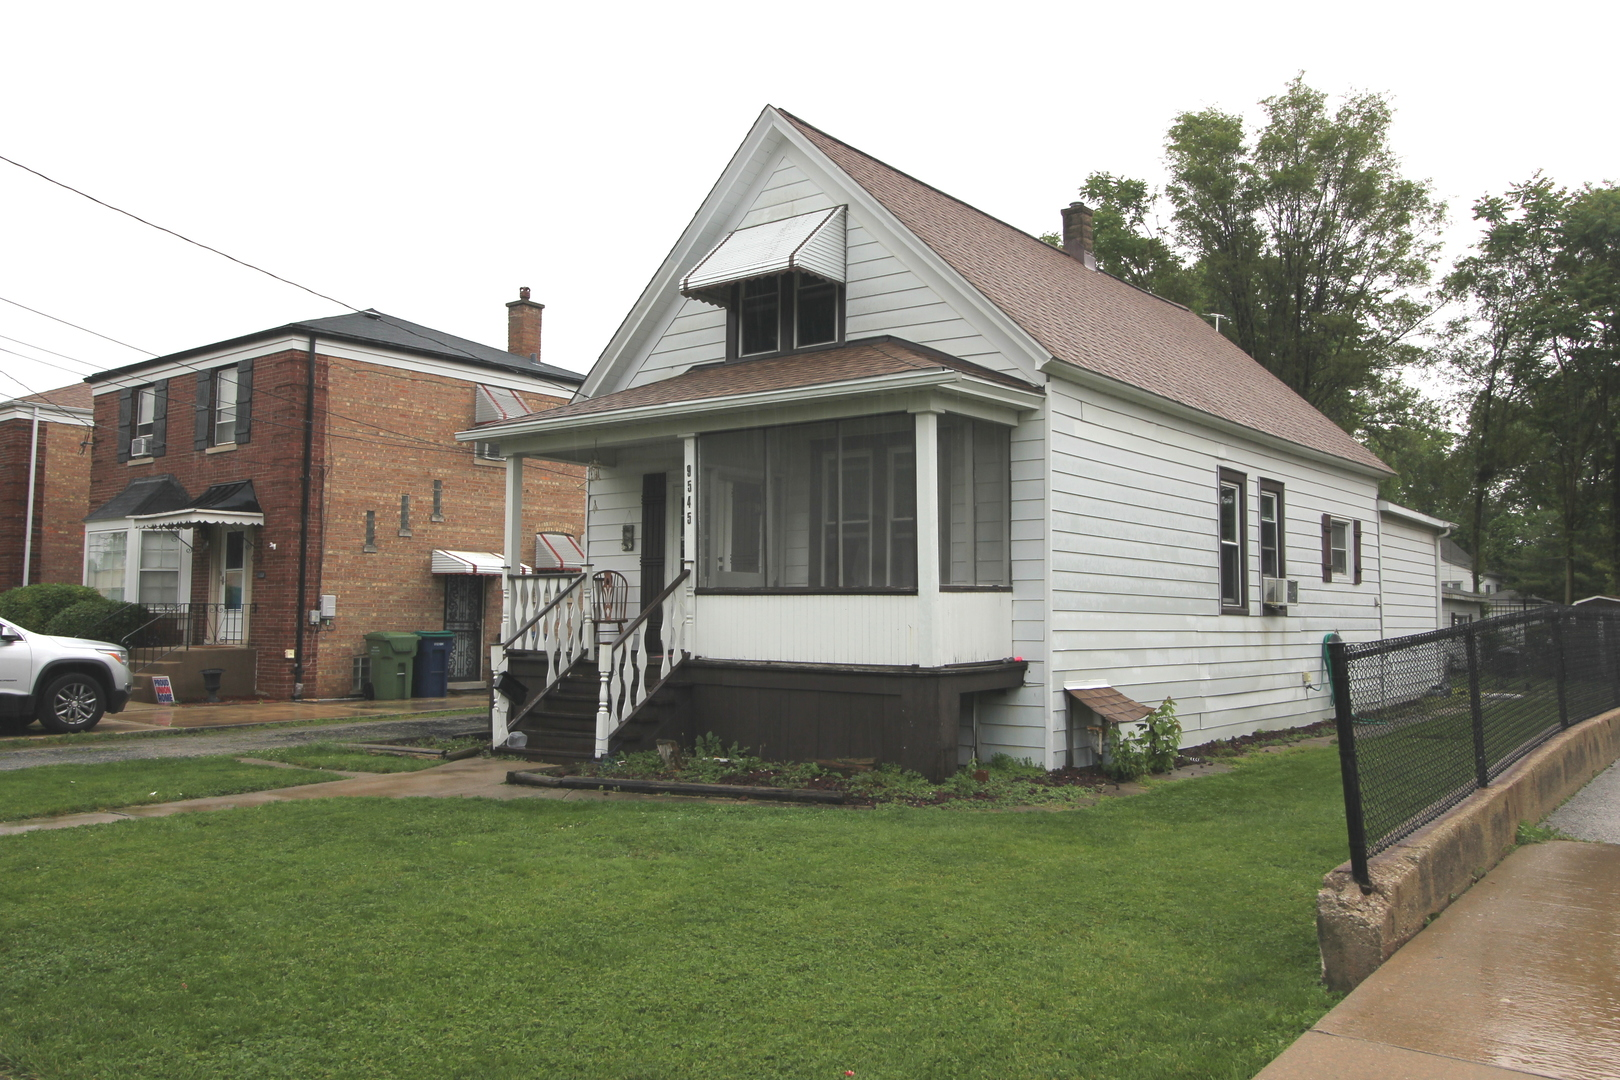 Photo of 9545 Homan Avenue Evergreen Park Illinois 60805